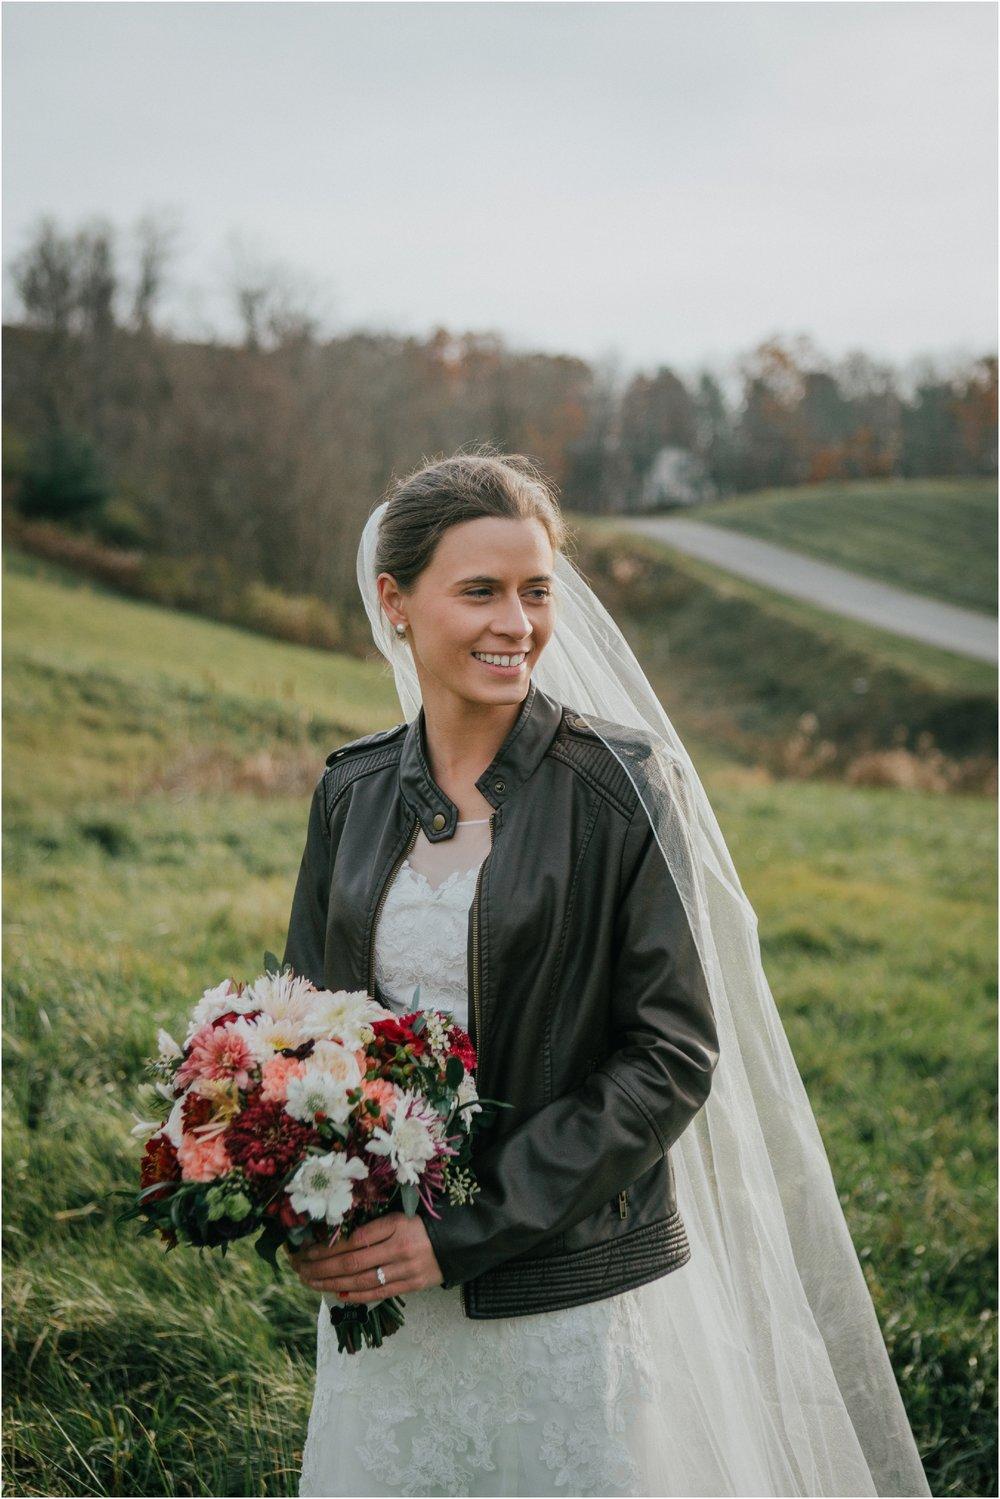 warm-springs-old-dairy-virginia-rustic-wedding-northeast-tennessee-elopement-adventuruous-photographer-katy-sergent_0060.jpg